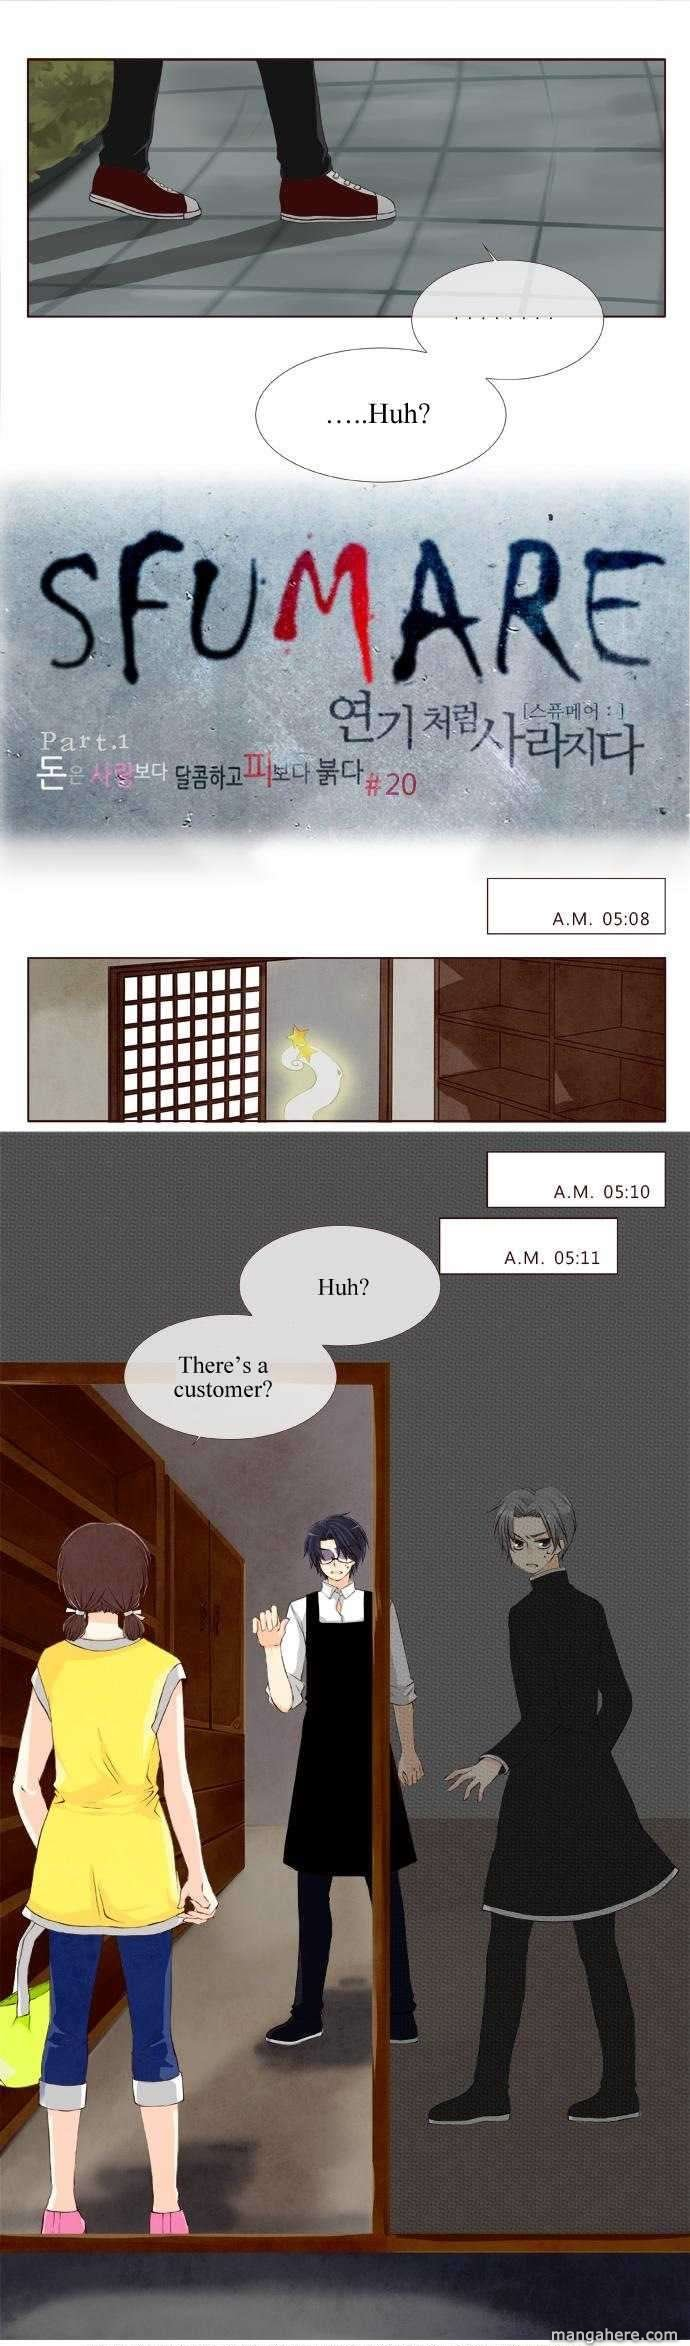 Sfumare 20 Page 2